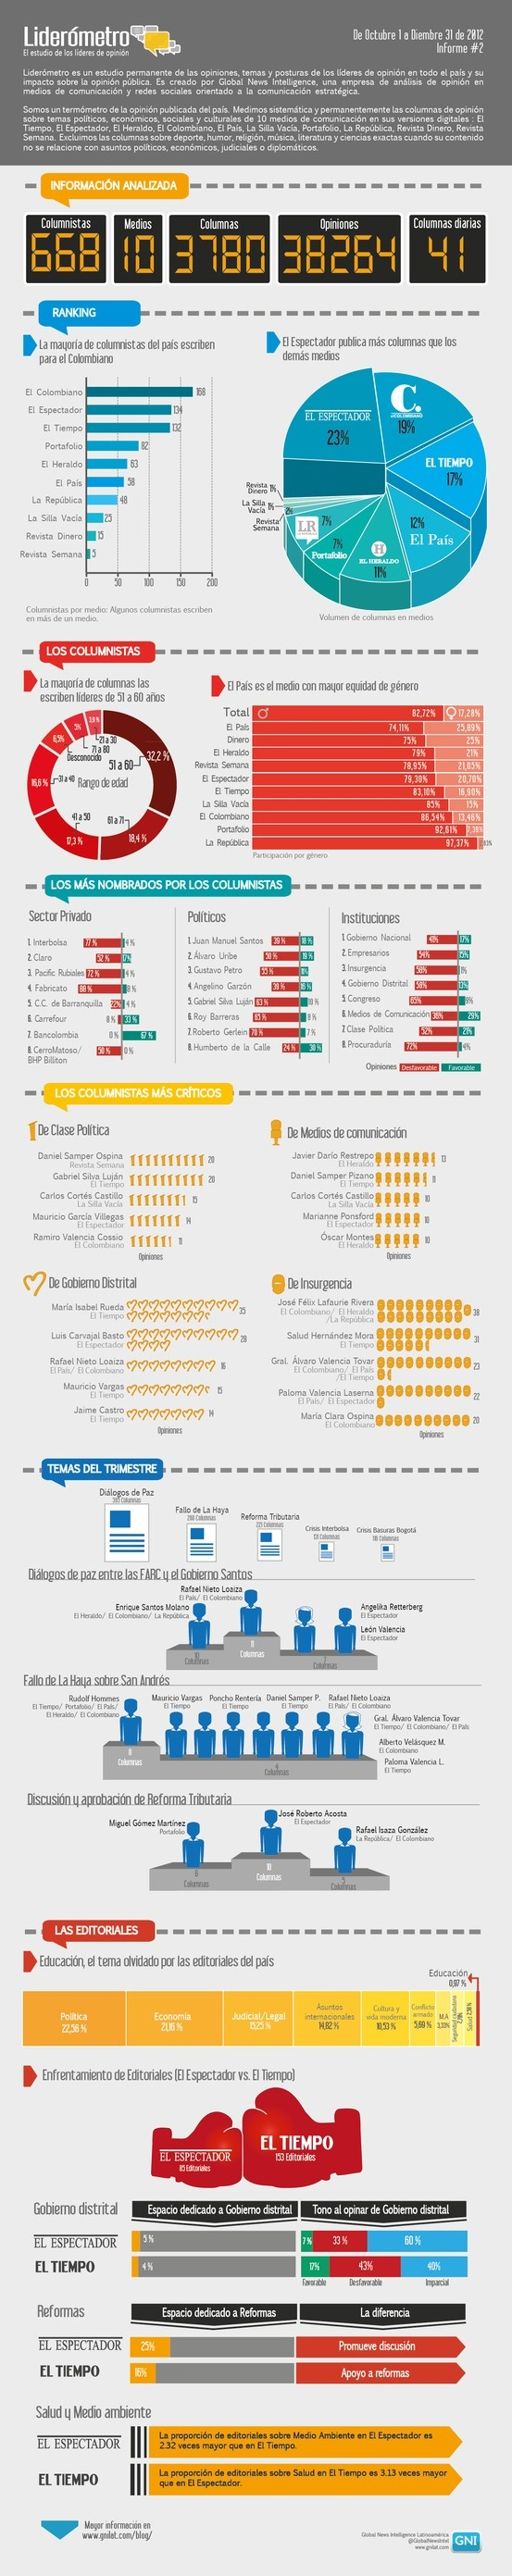 Informe del Liderómetro de Octubre a Diciembre de 2012